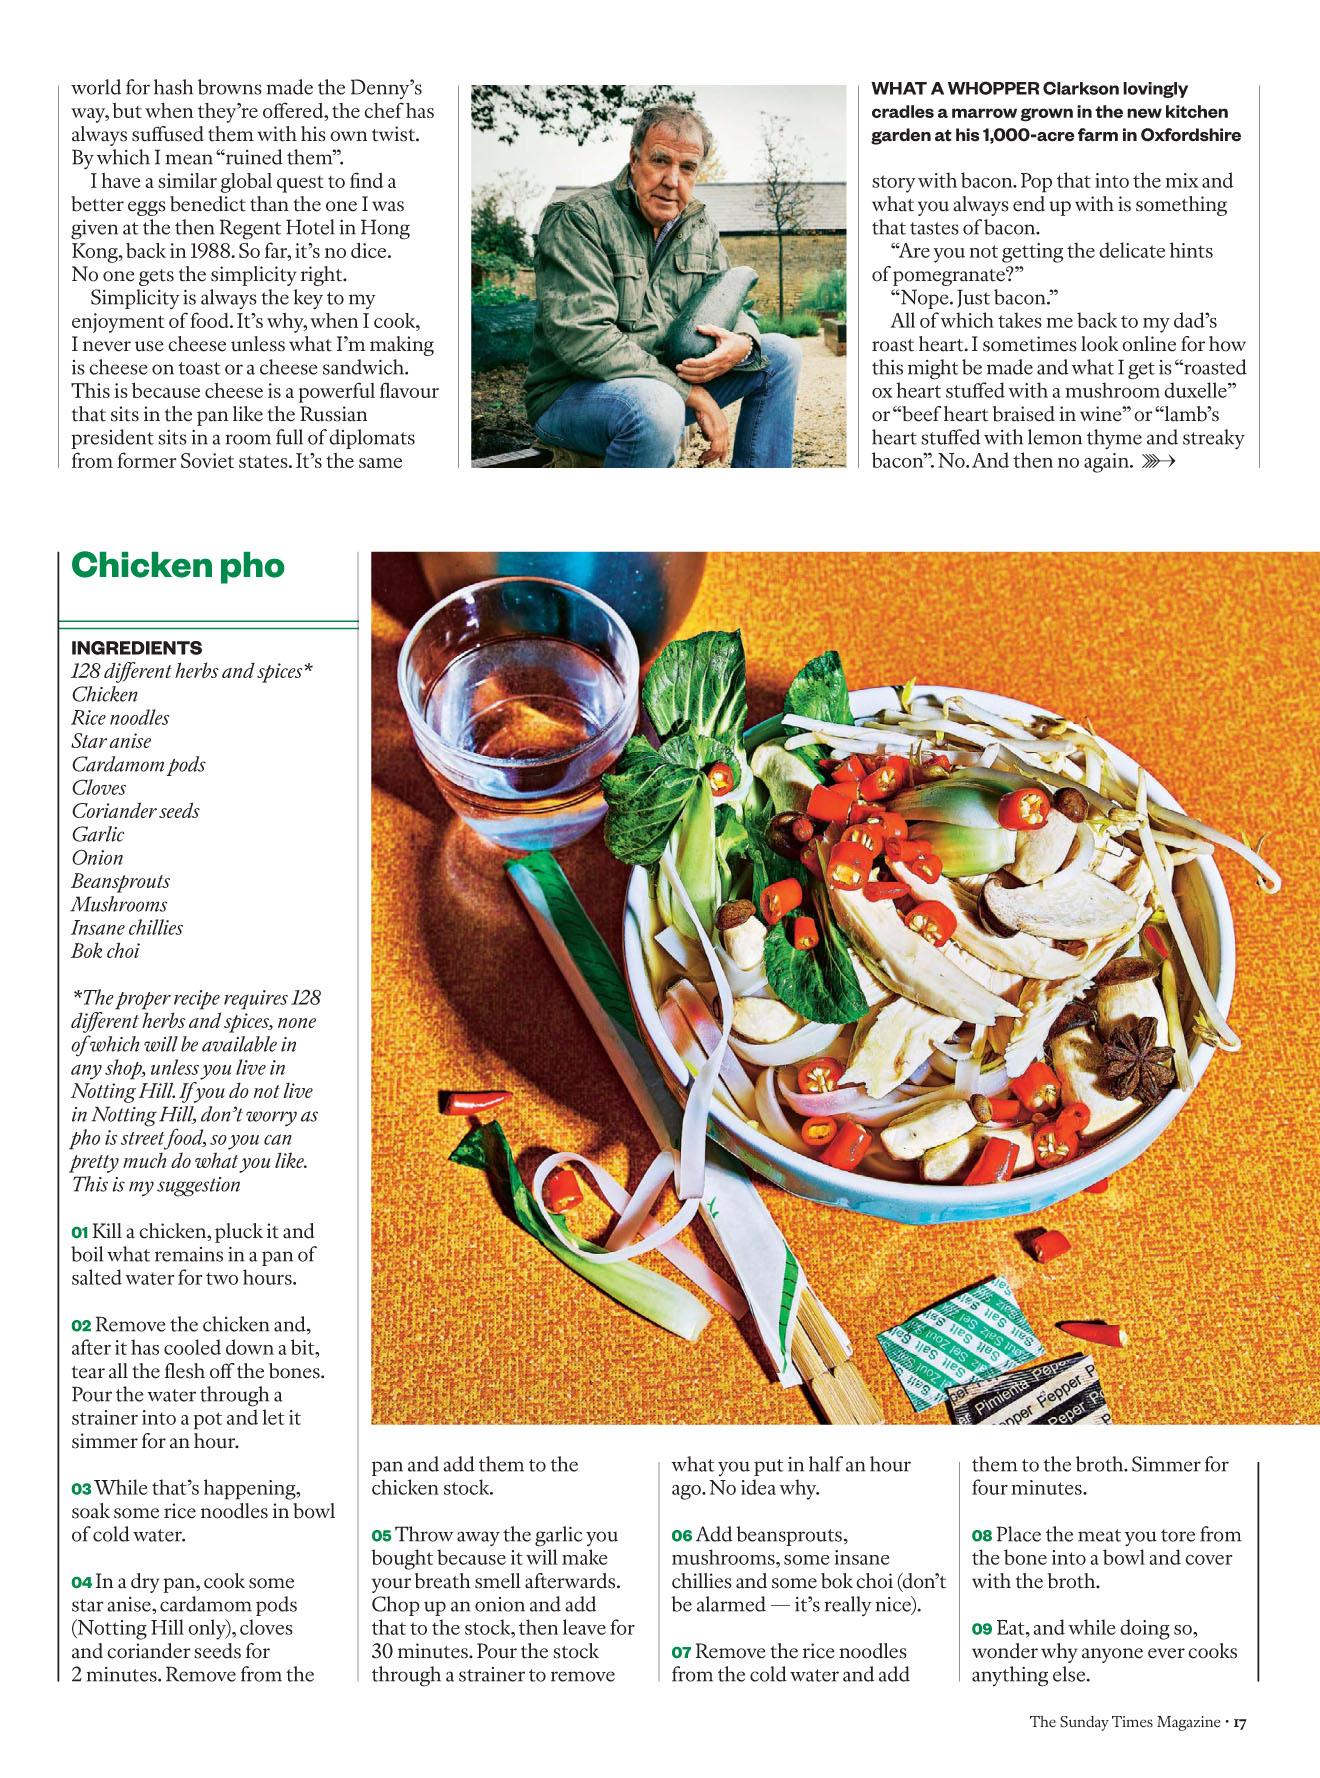 The Sunday Times Magazine 200301 JClarkson-6.jpg